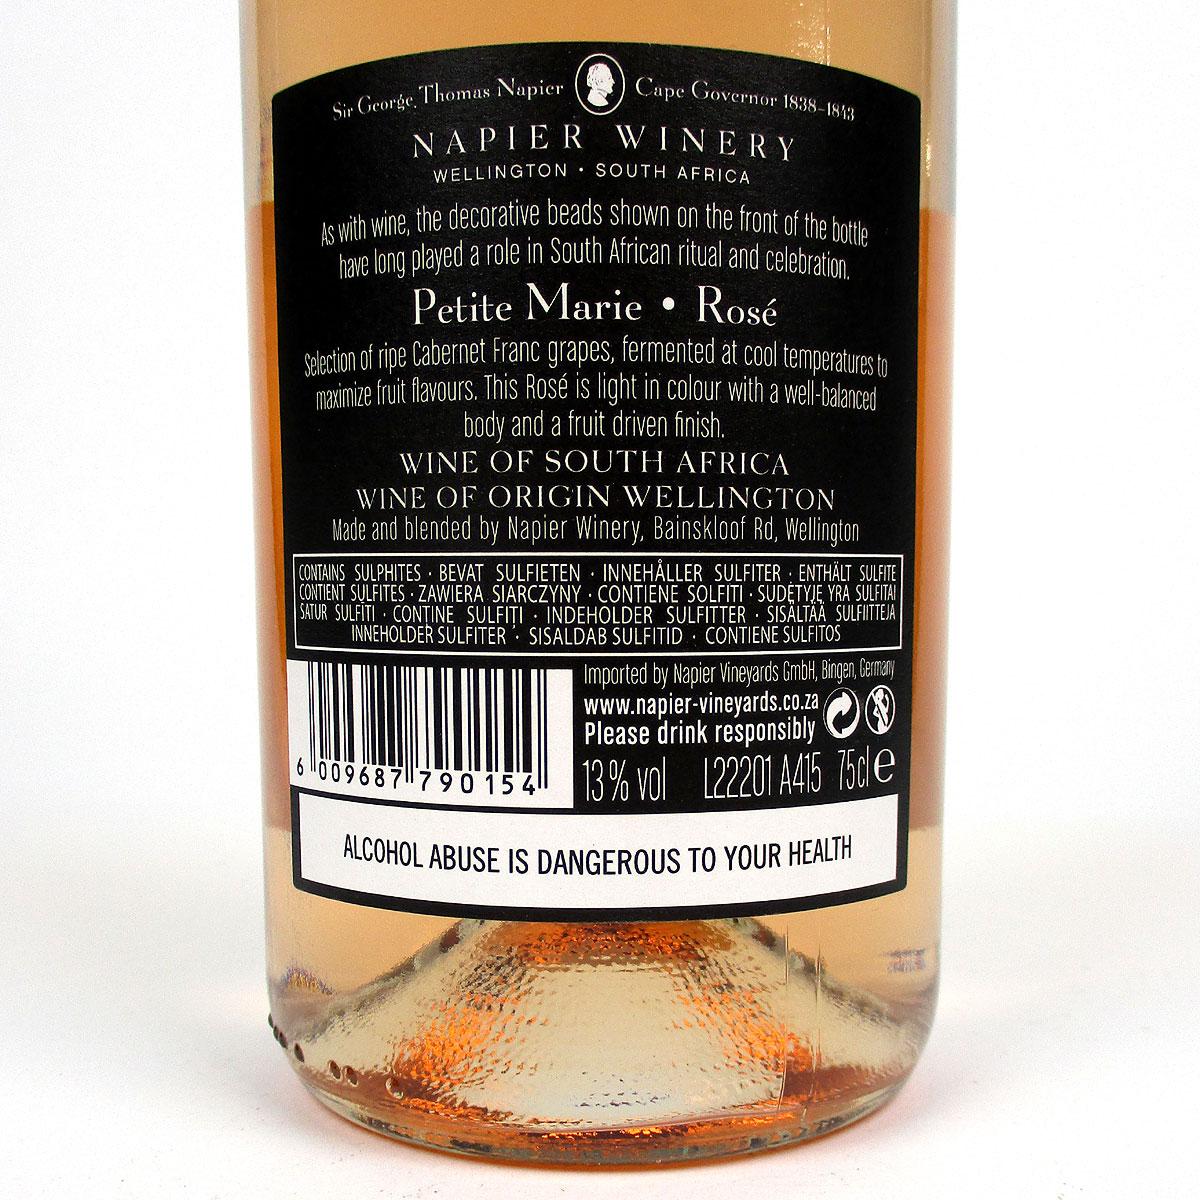 Napier Winery: 'Petite Marie' Rosé 2020 - Bottle Rear Label